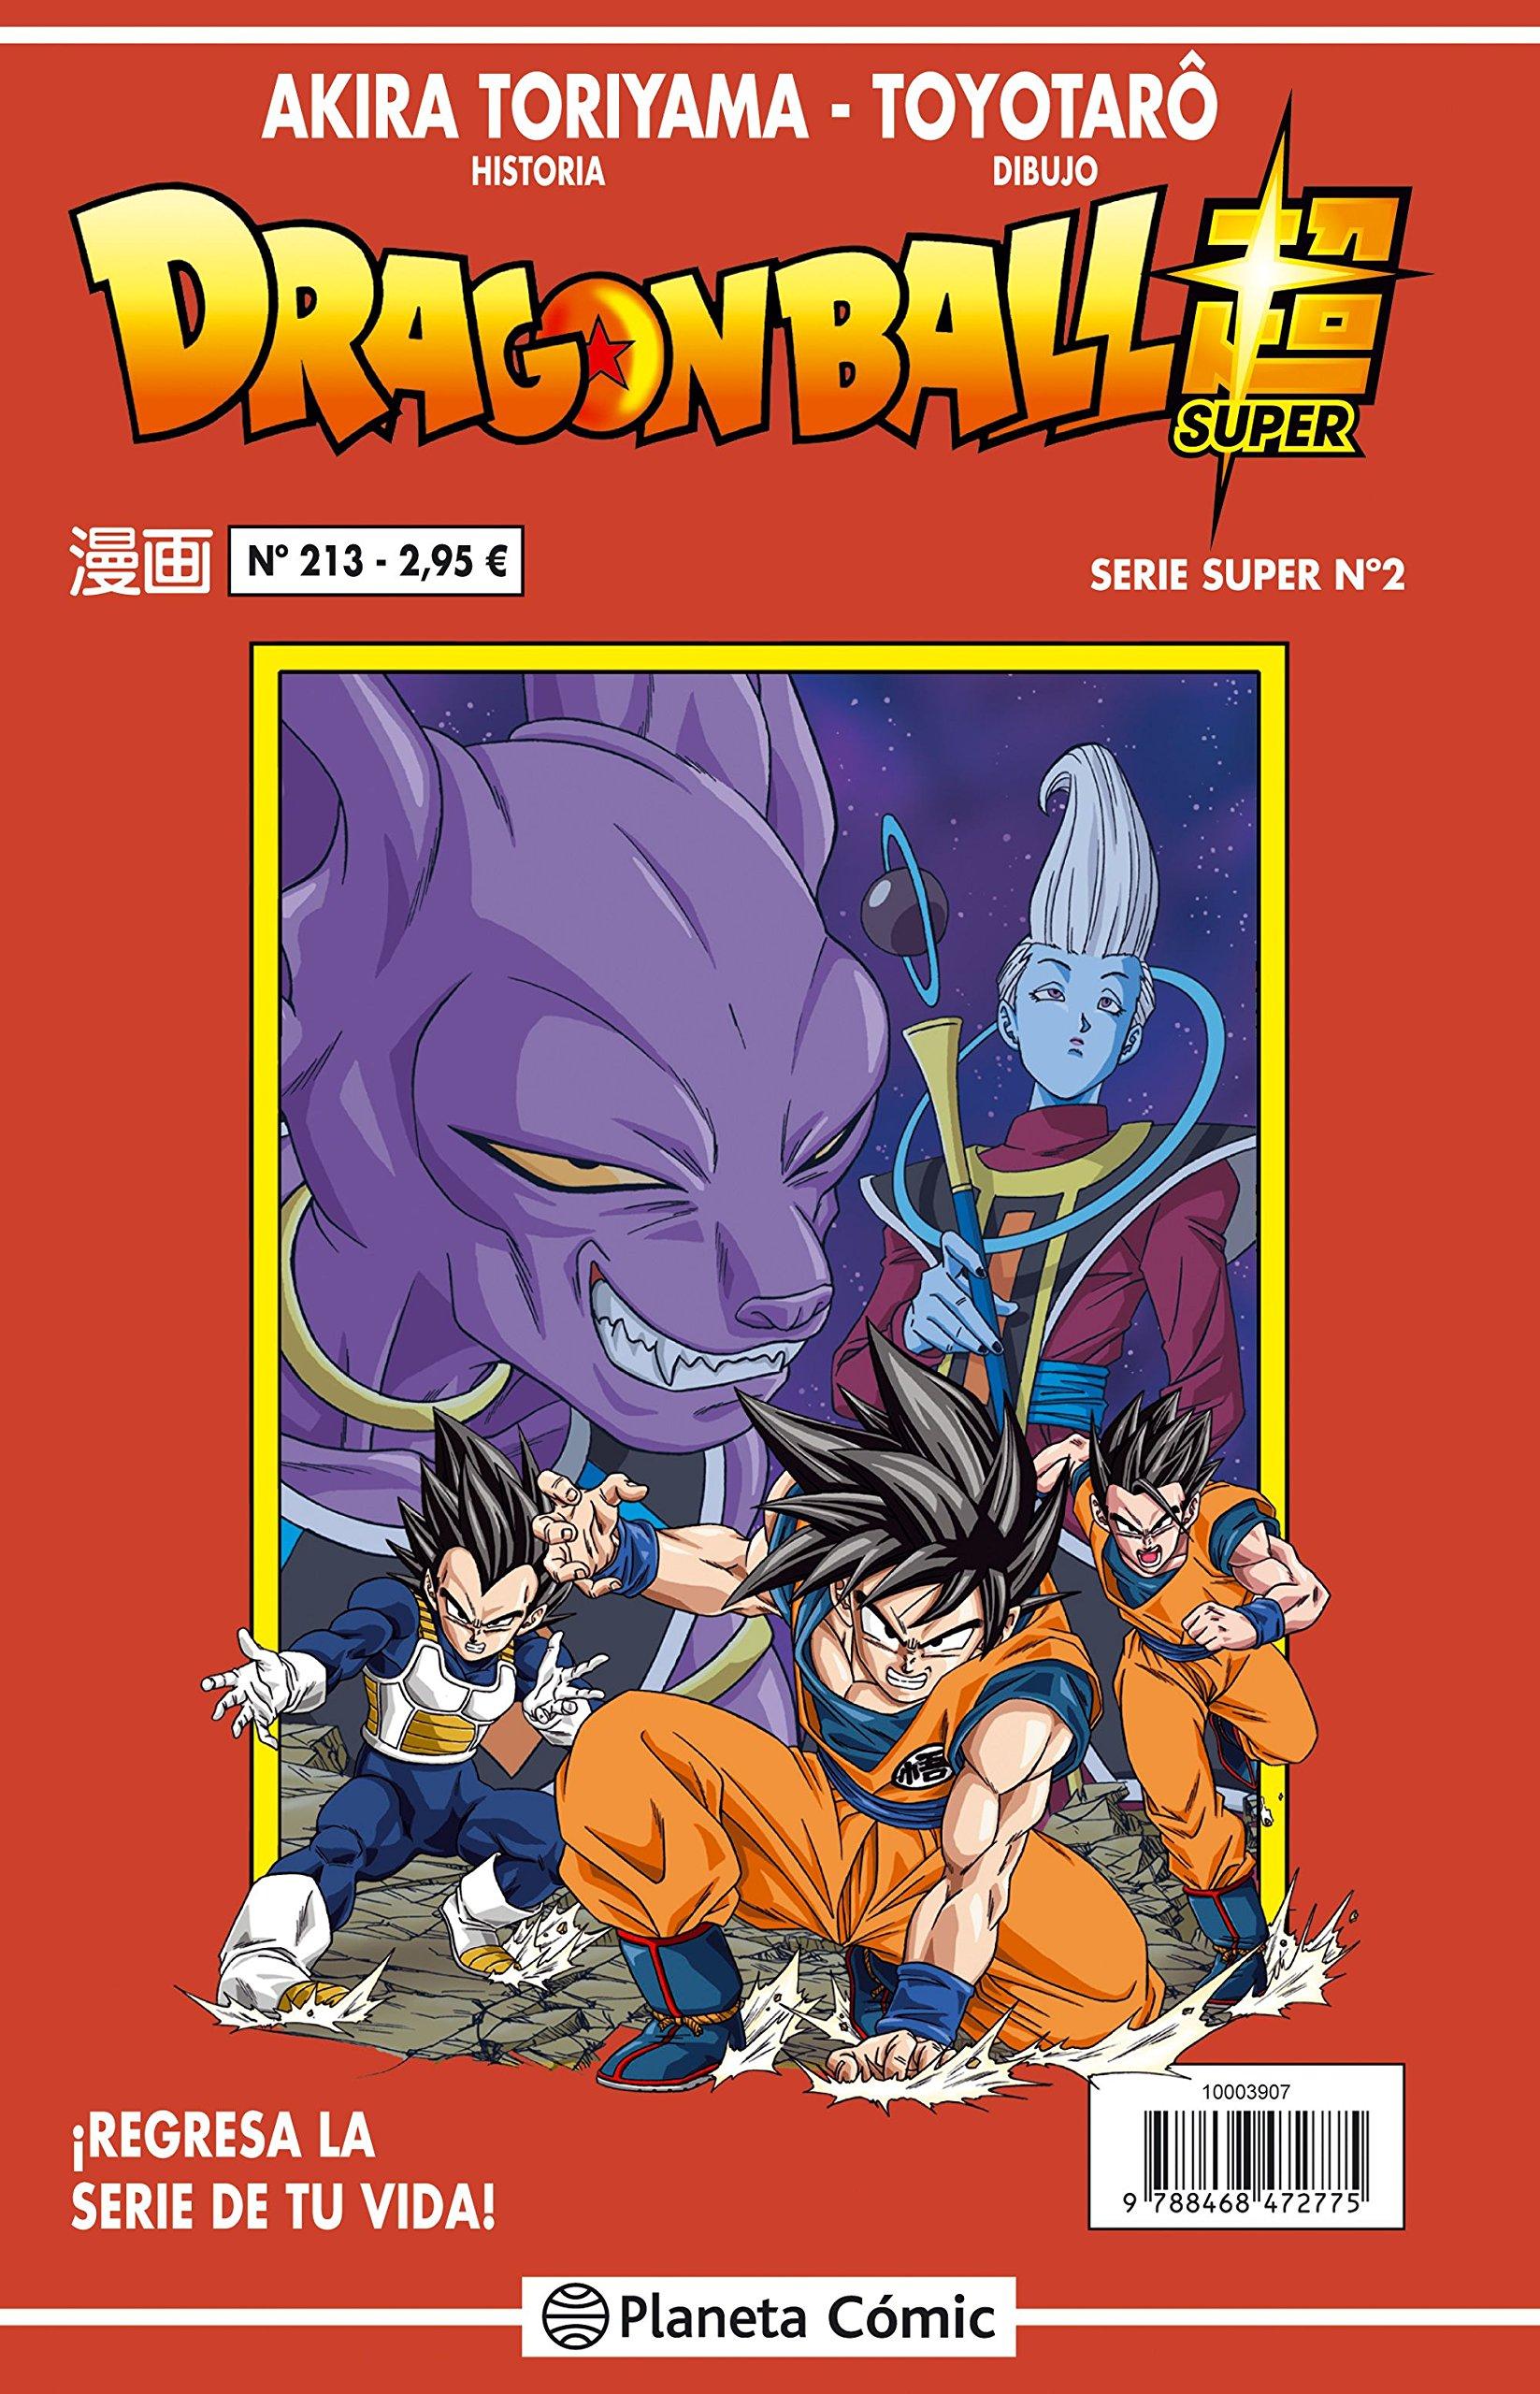 Dragon Ball Serie roja nº 213 (Manga Shonen) Tapa blanda – 10 abr 2018 Akira Toriyama Daruma Planeta DeAgostini Cómics 8416889775